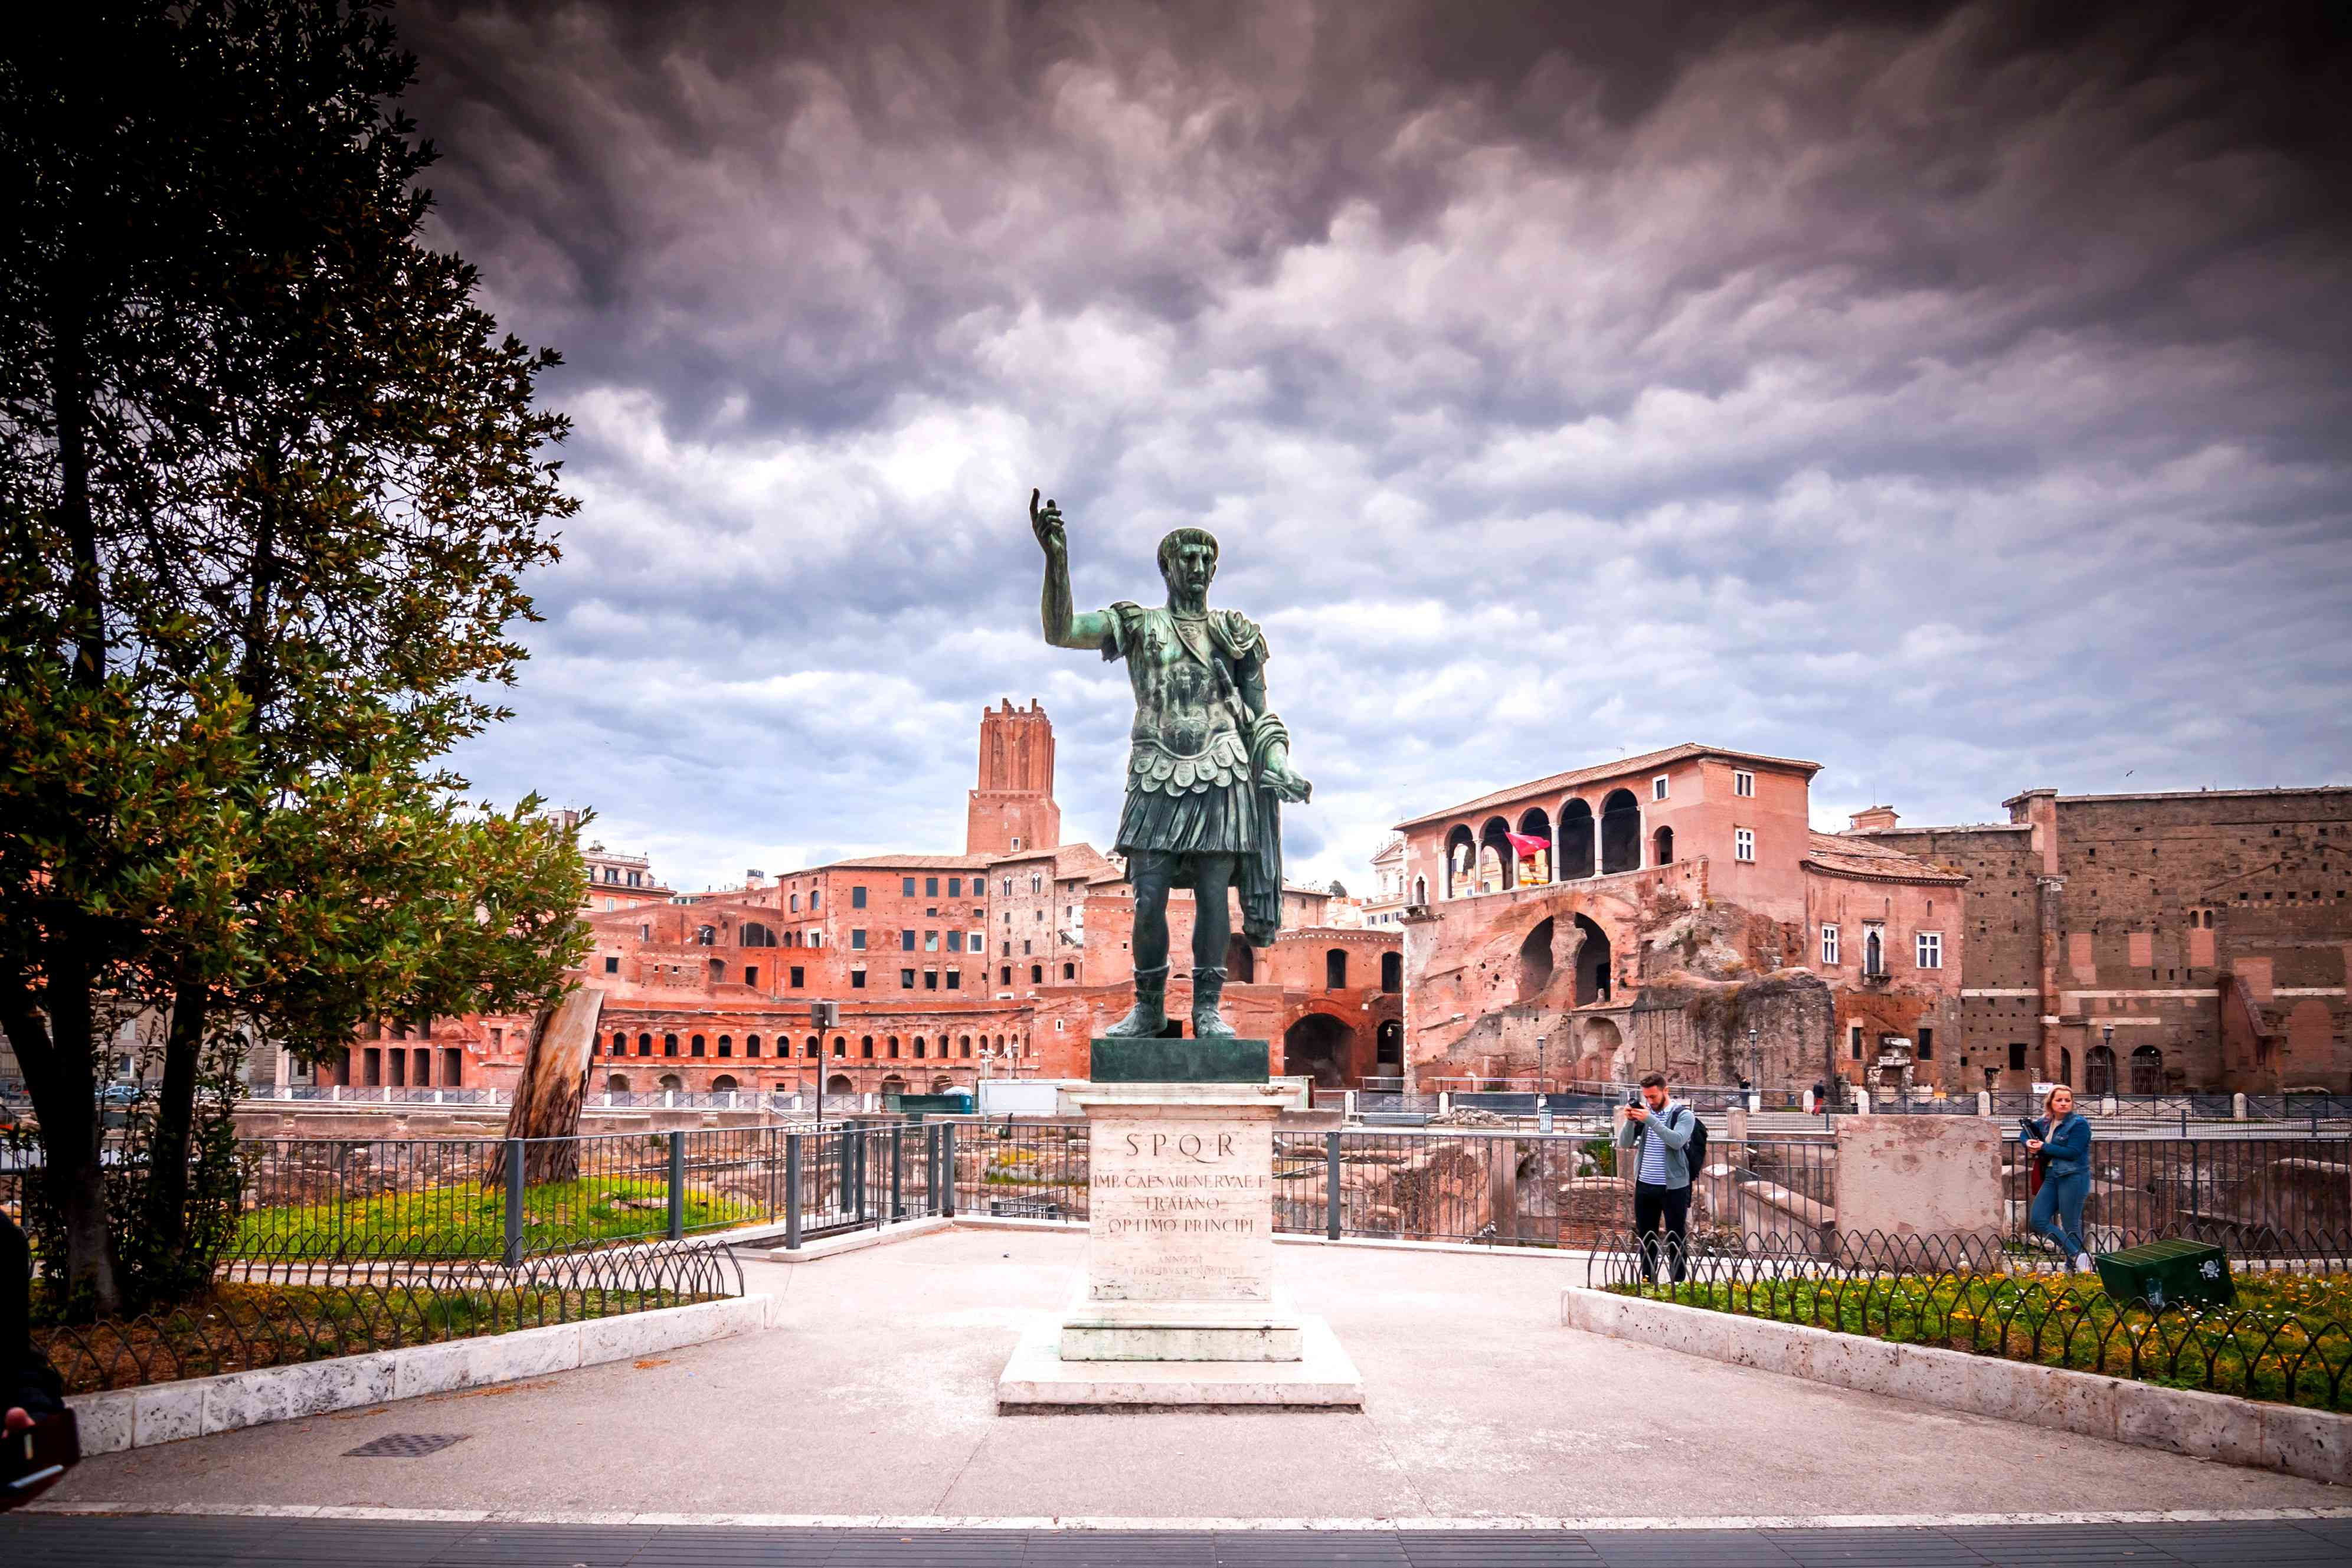 A statue of Julius Caesar in the historical open-air museum, the Roman Forum